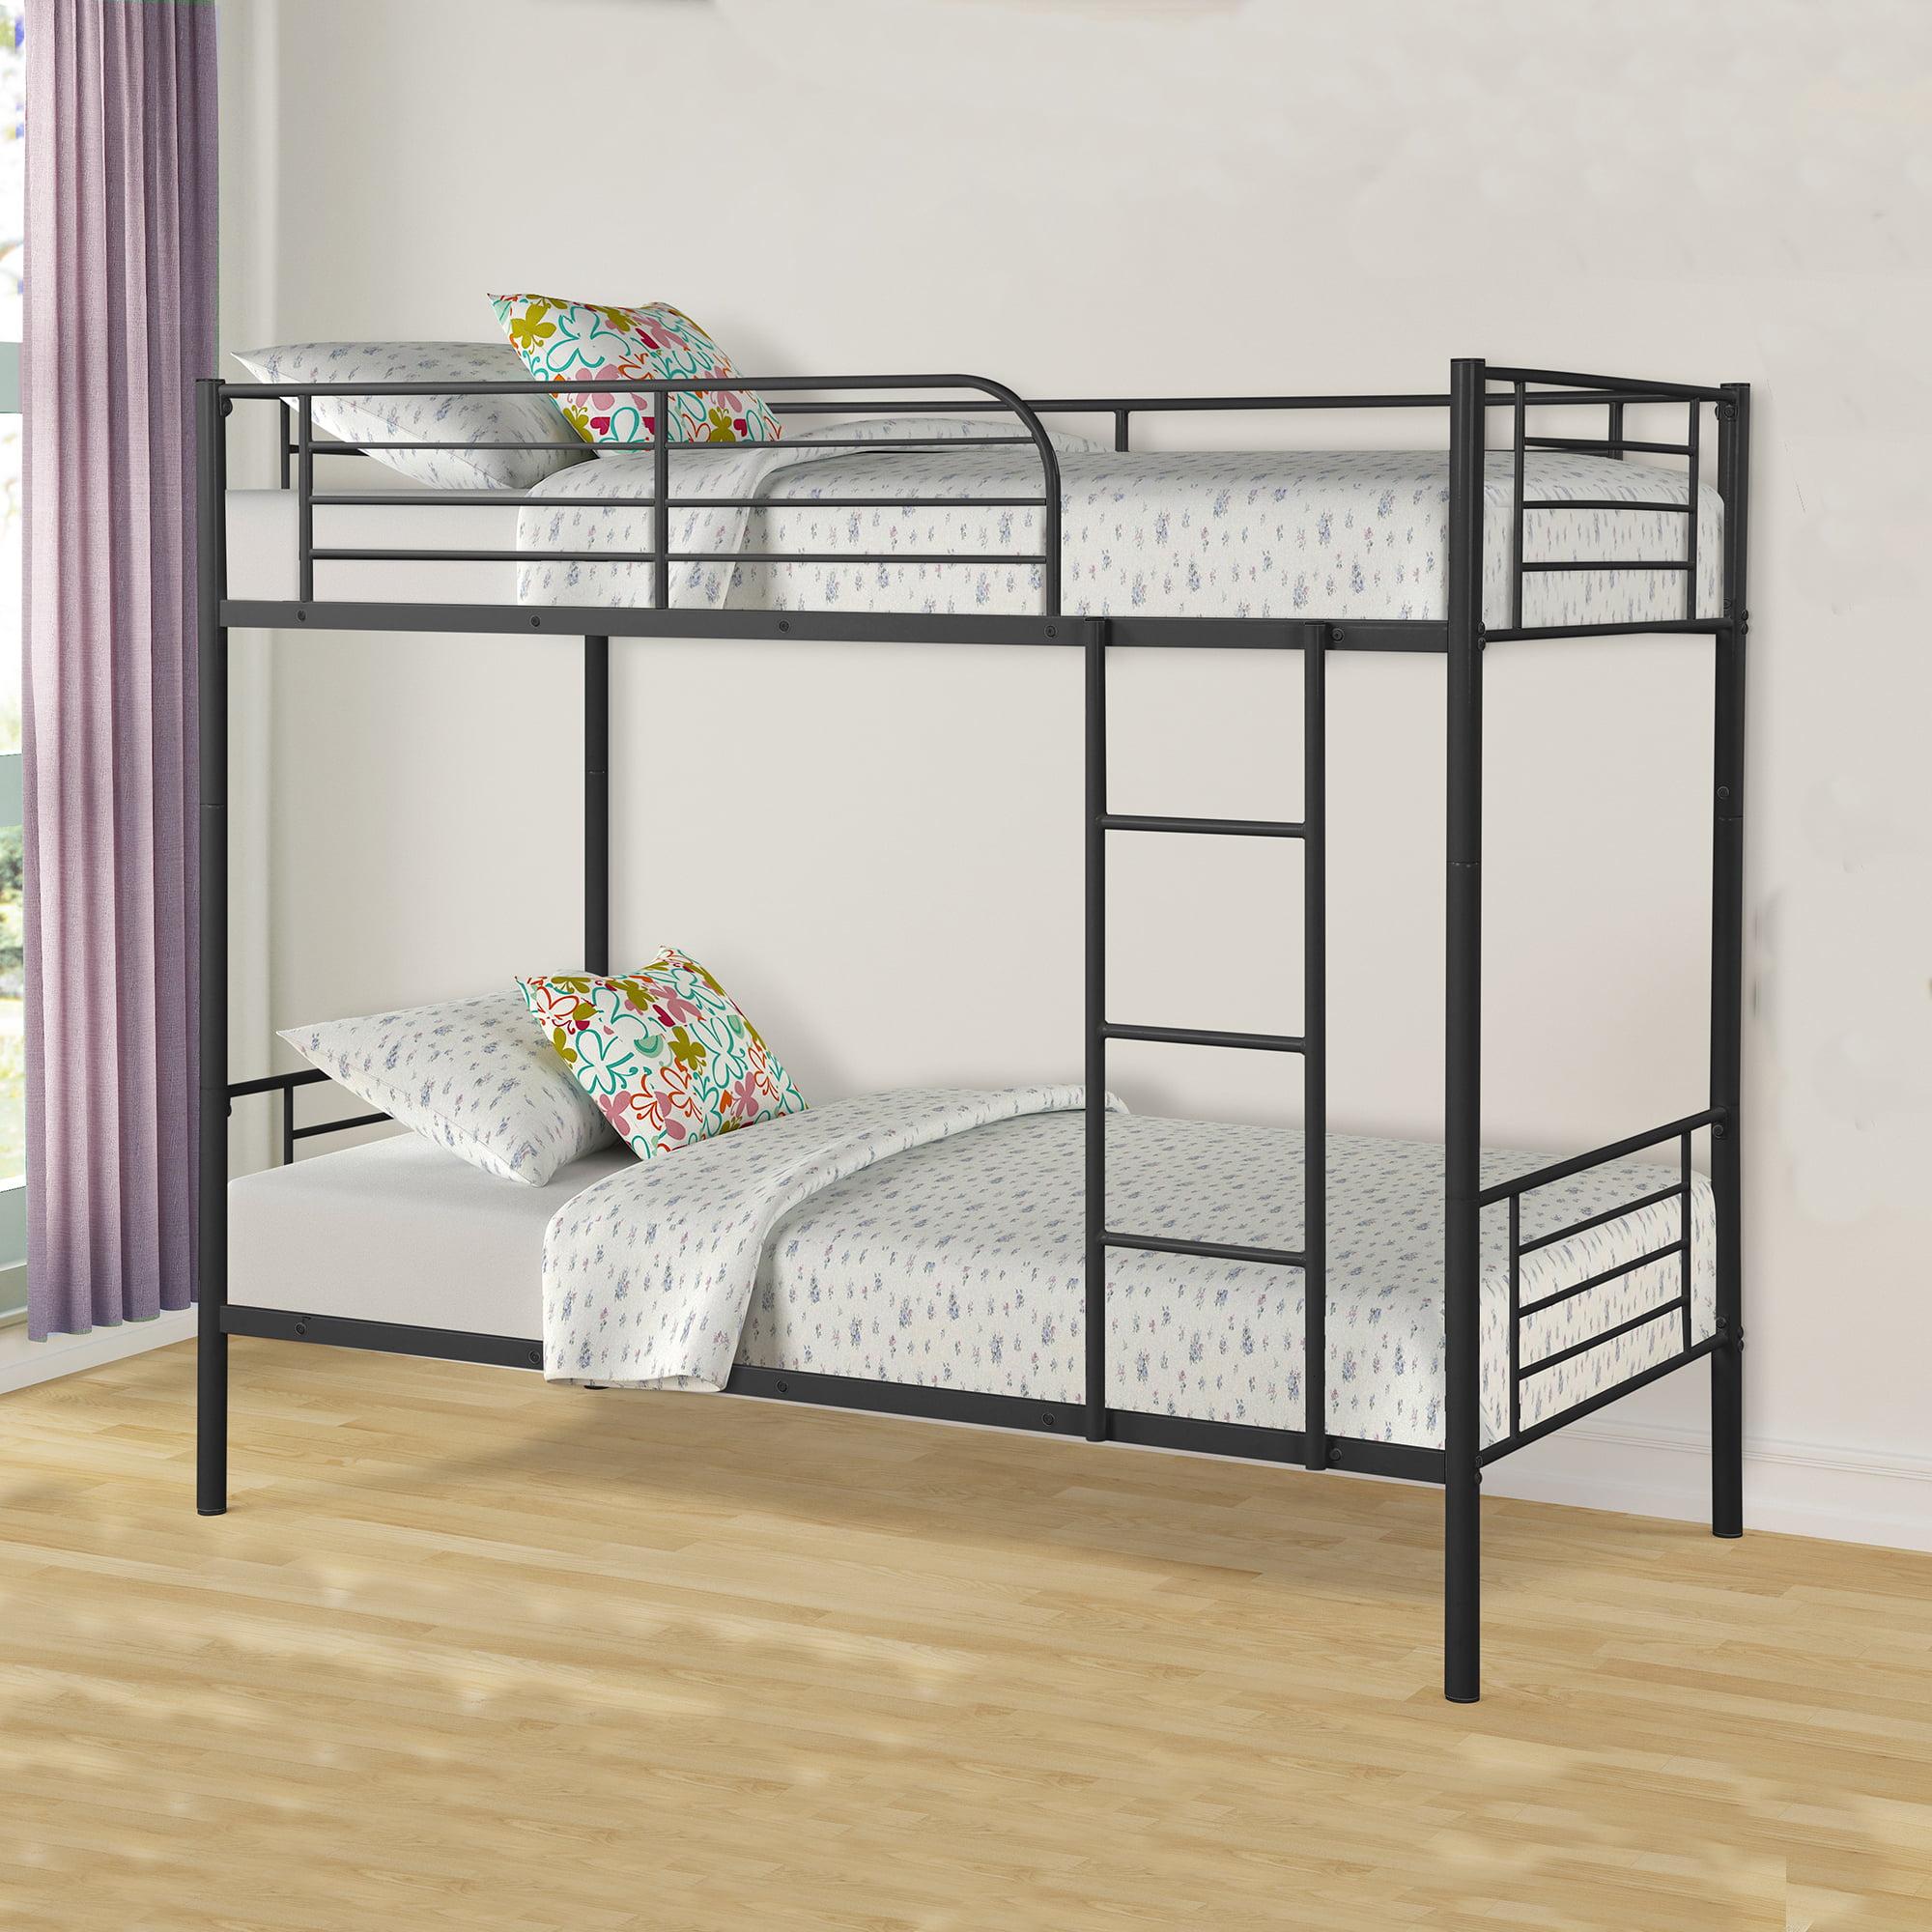 Metal Twin over Twin Bunk Beds Frame Ladder Kids Adult Bedroom Dorm Black NEW